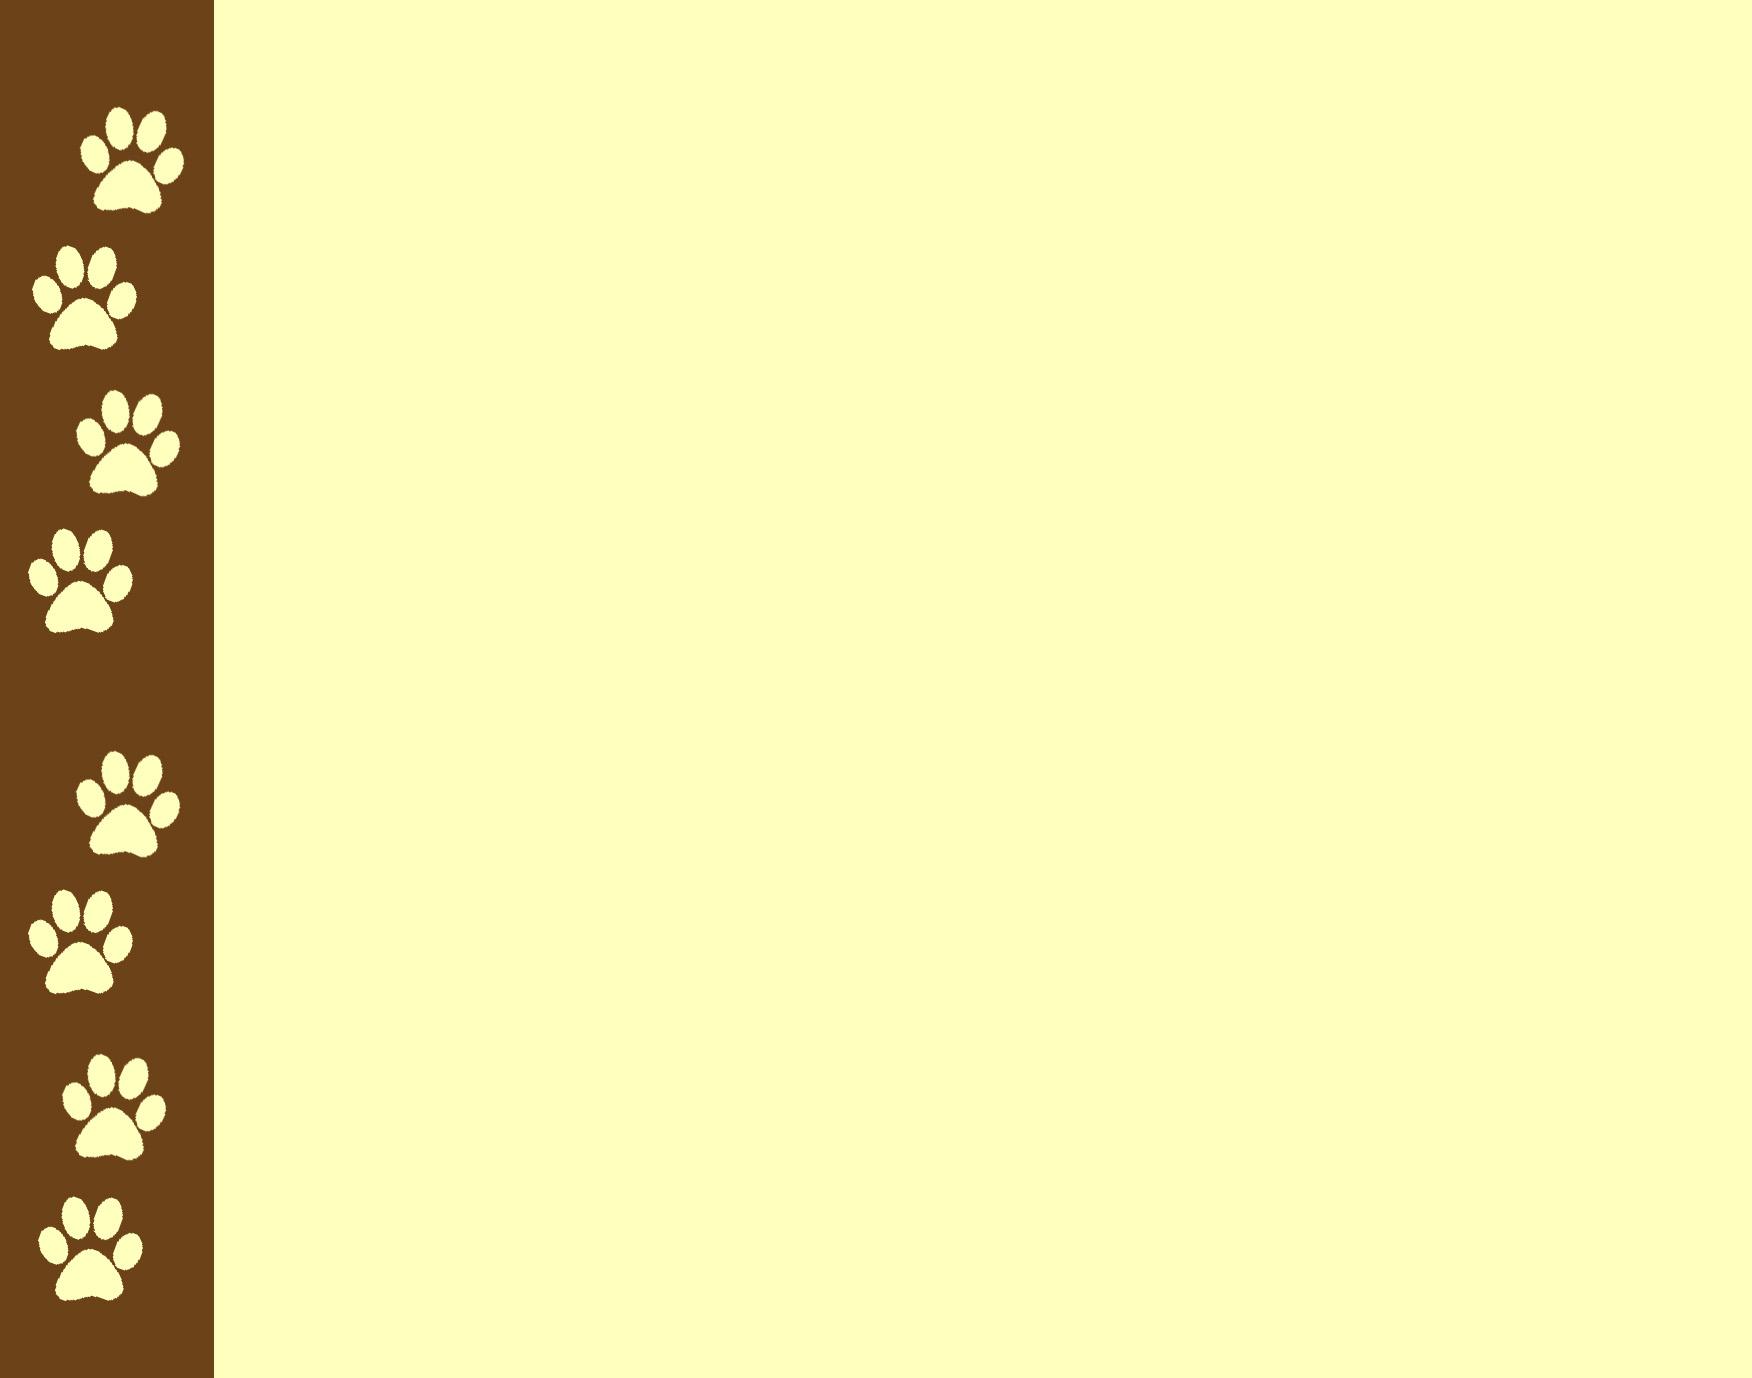 kb jpeg paw print border 735 x 541 44 kb gif dog paw print border clip 1752x1378